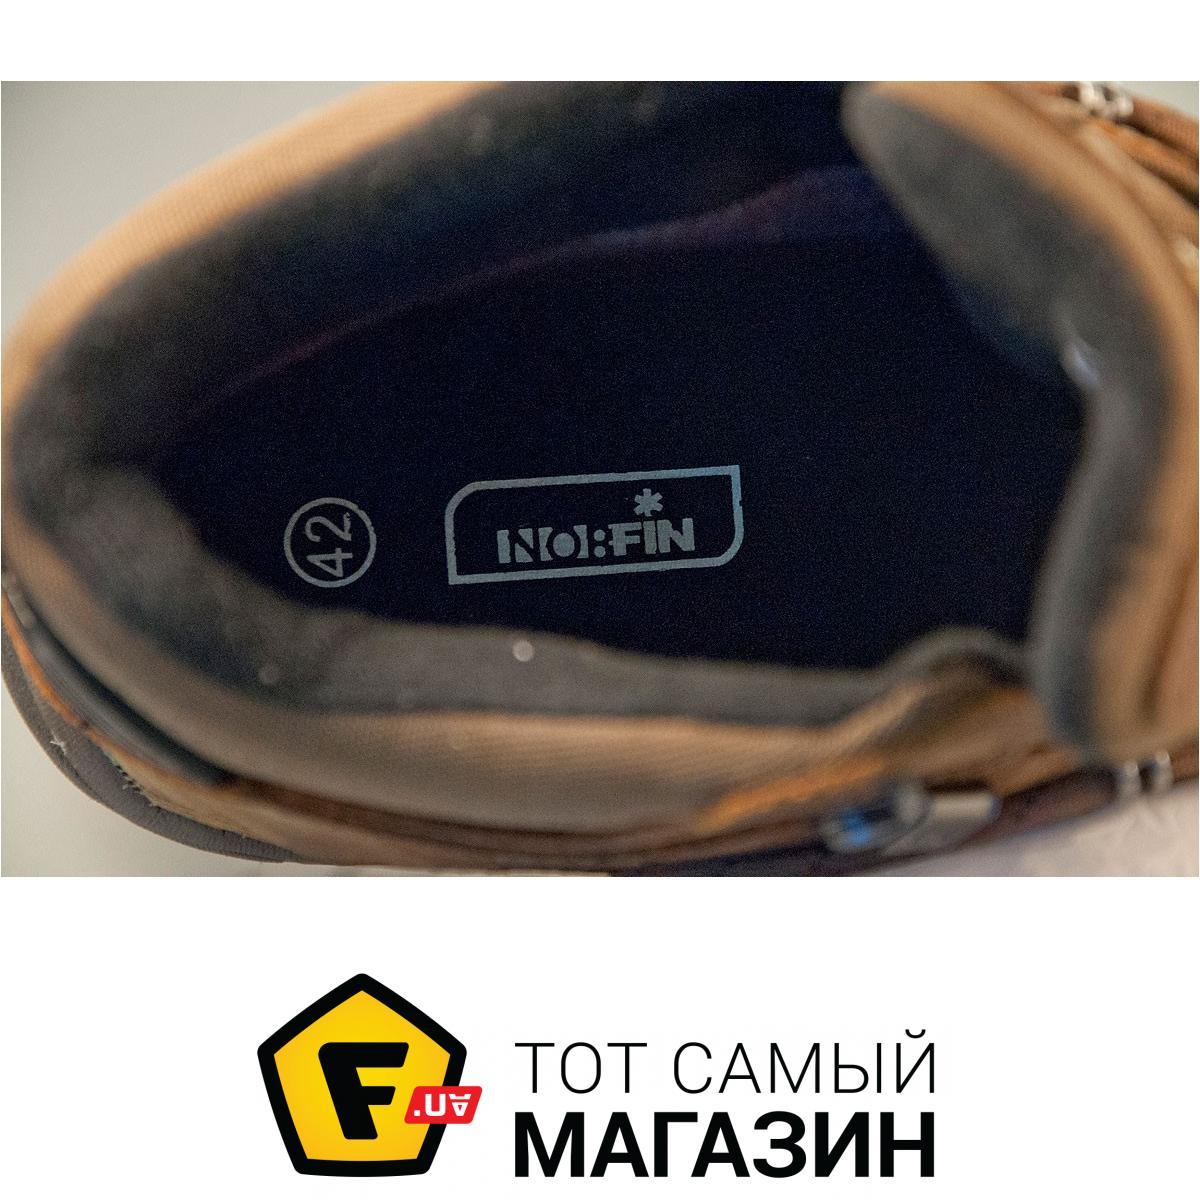 ᐈ NORFIN Scout 40 (13992-40) ~ Надо Купить  ЦЕНА Снижена ~ F.ua 1e81b10c5dd14